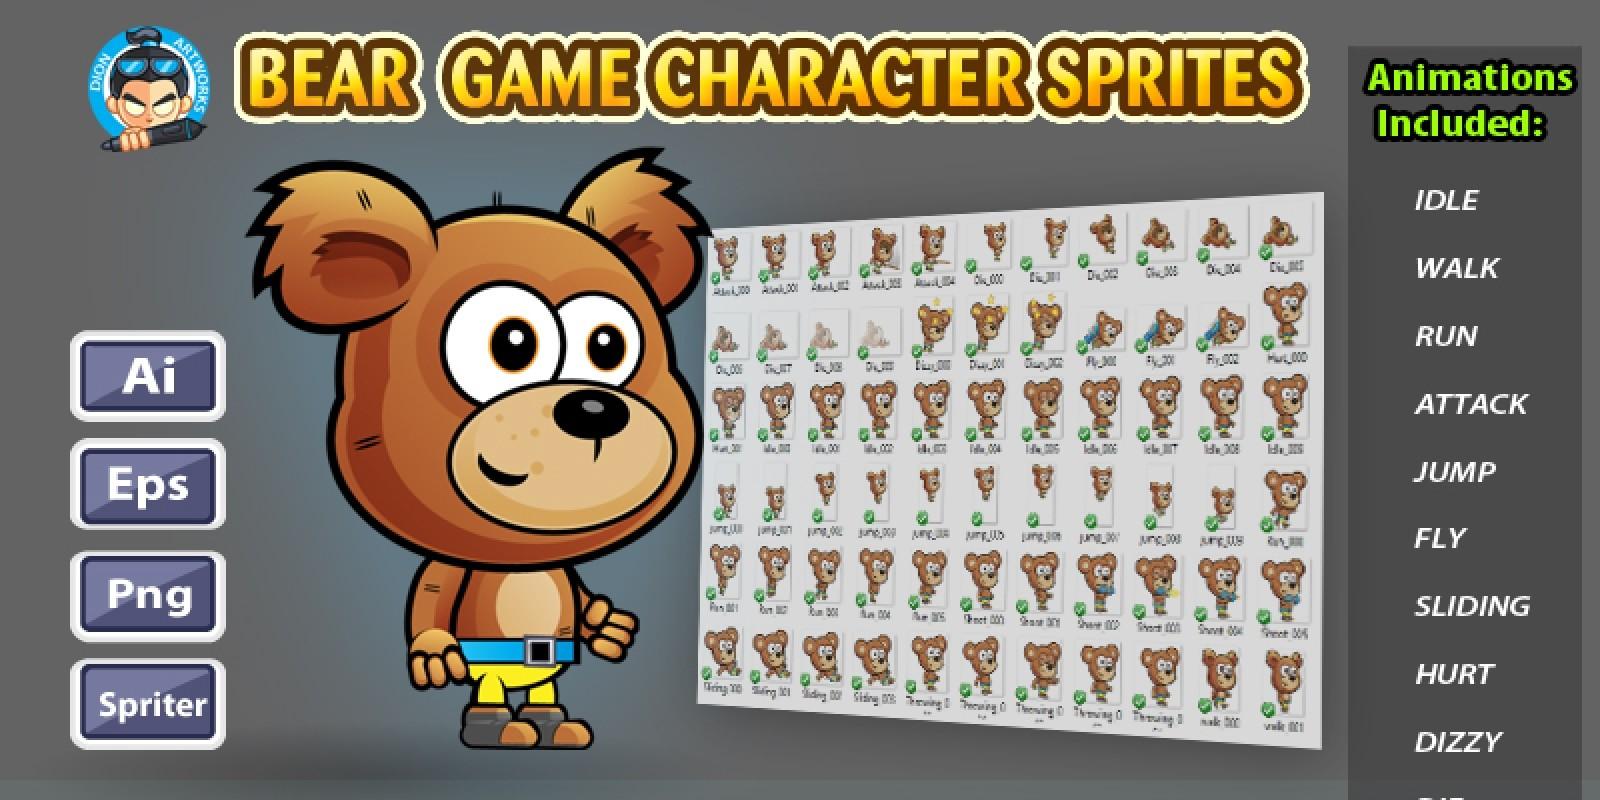 Bear 2D Game Characte Sprites